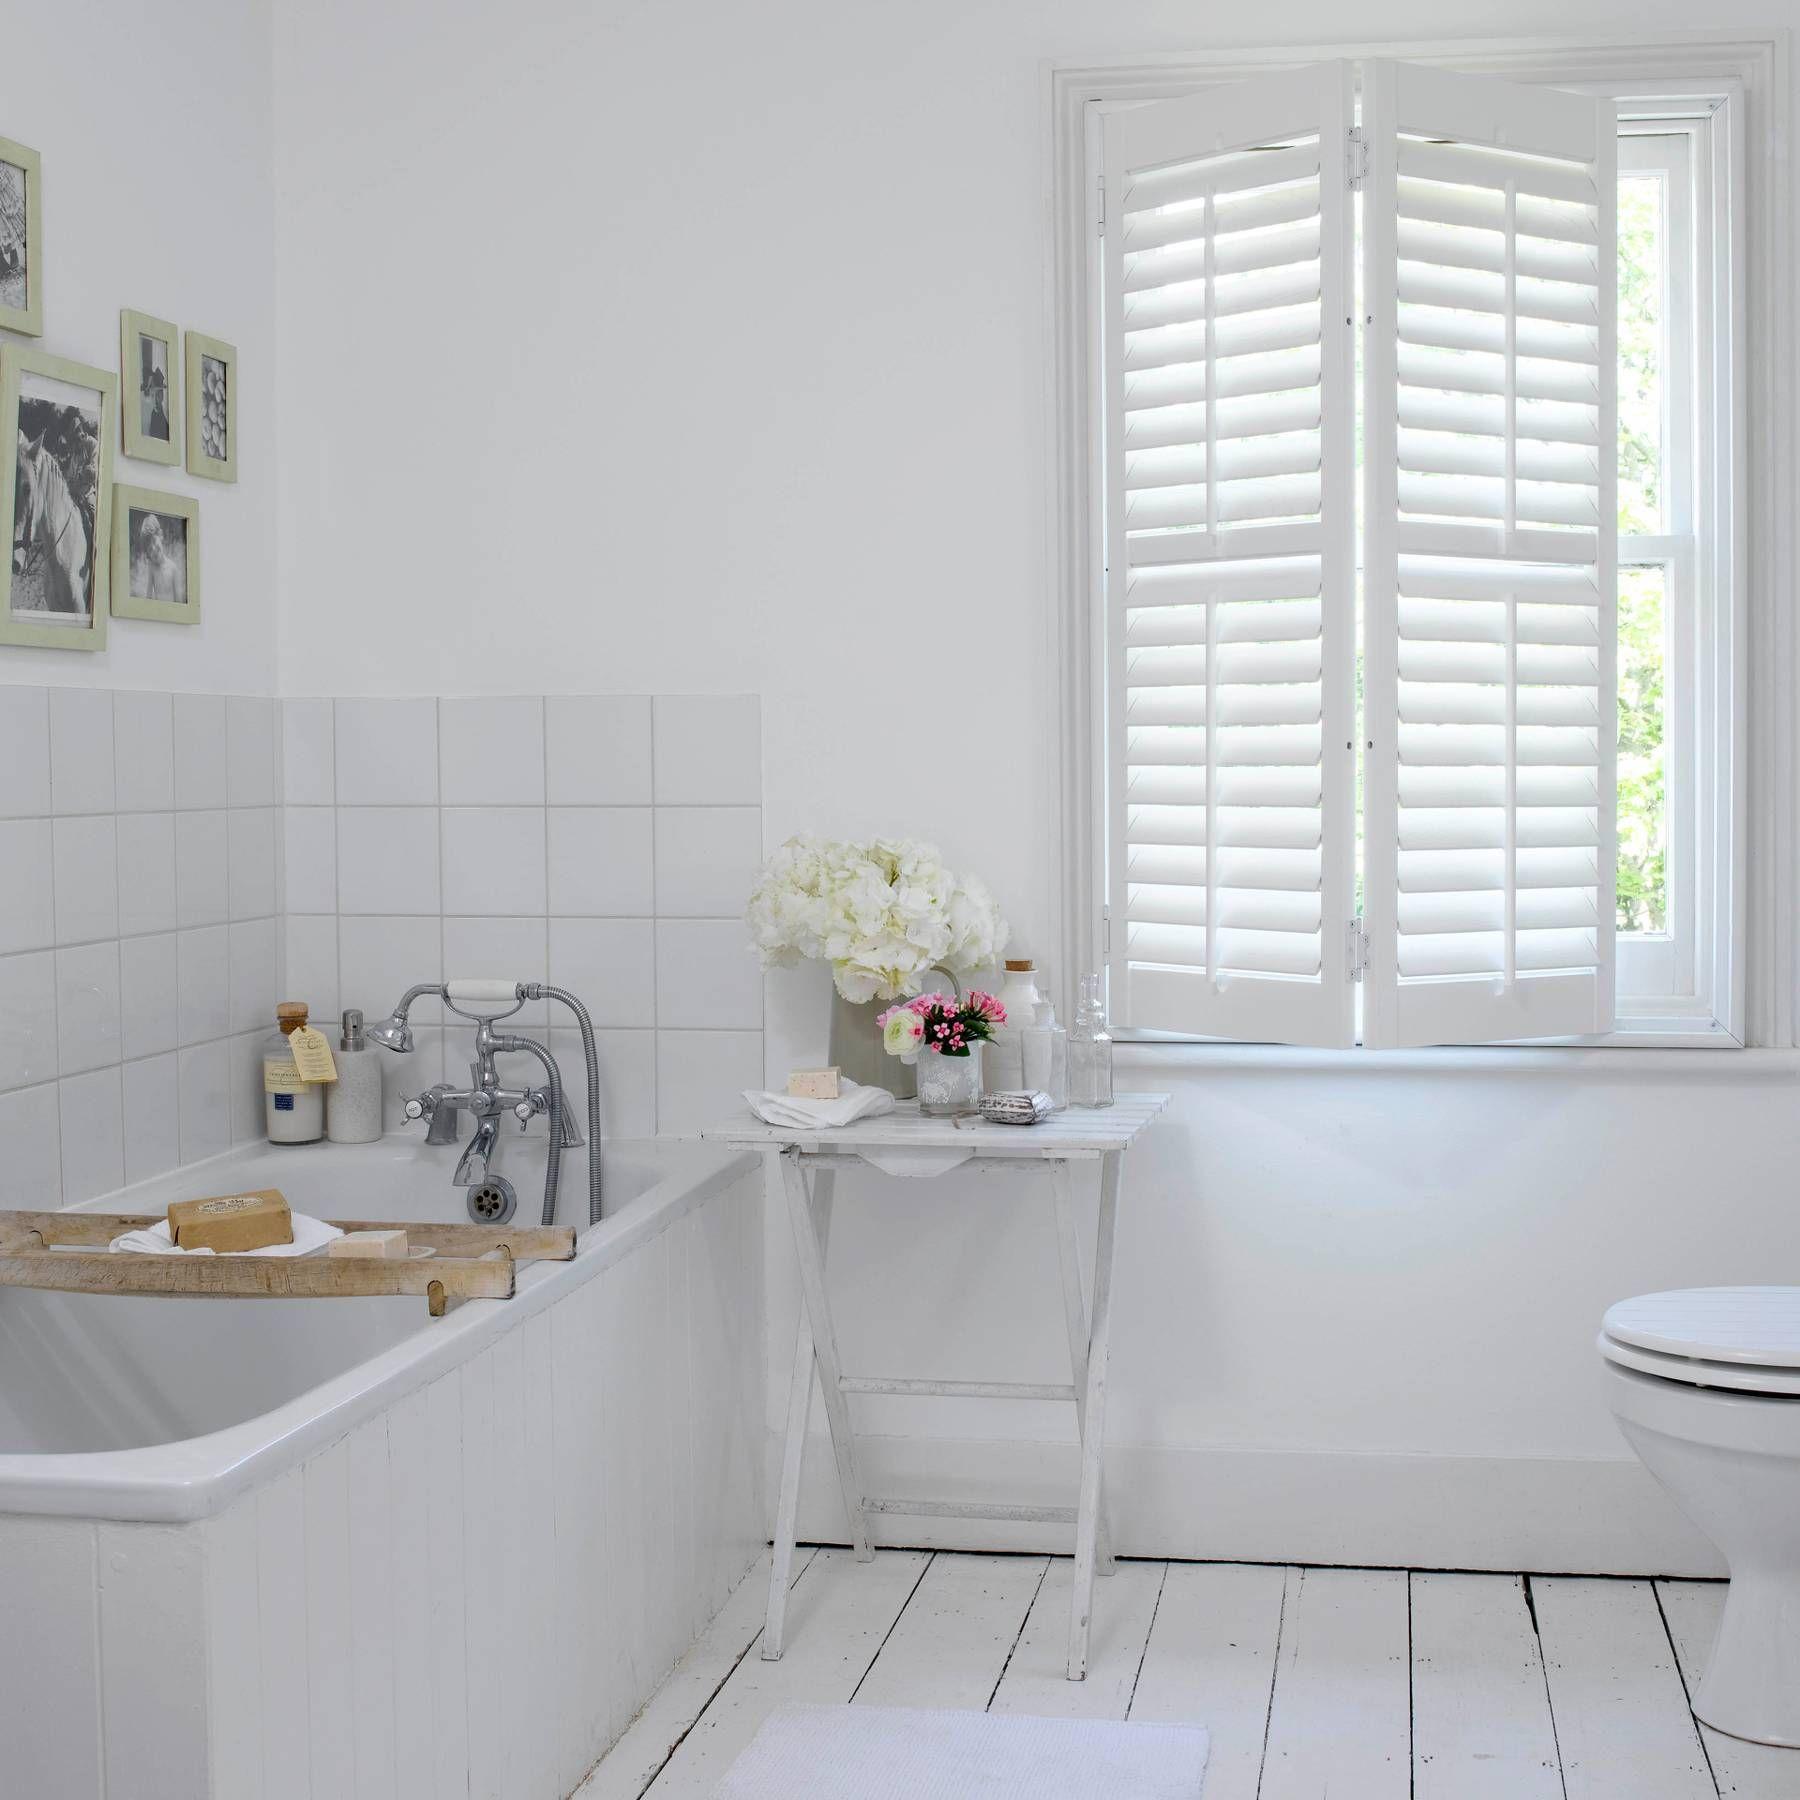 Bathroom ideas (With images) | Wood floor bathroom, White ...